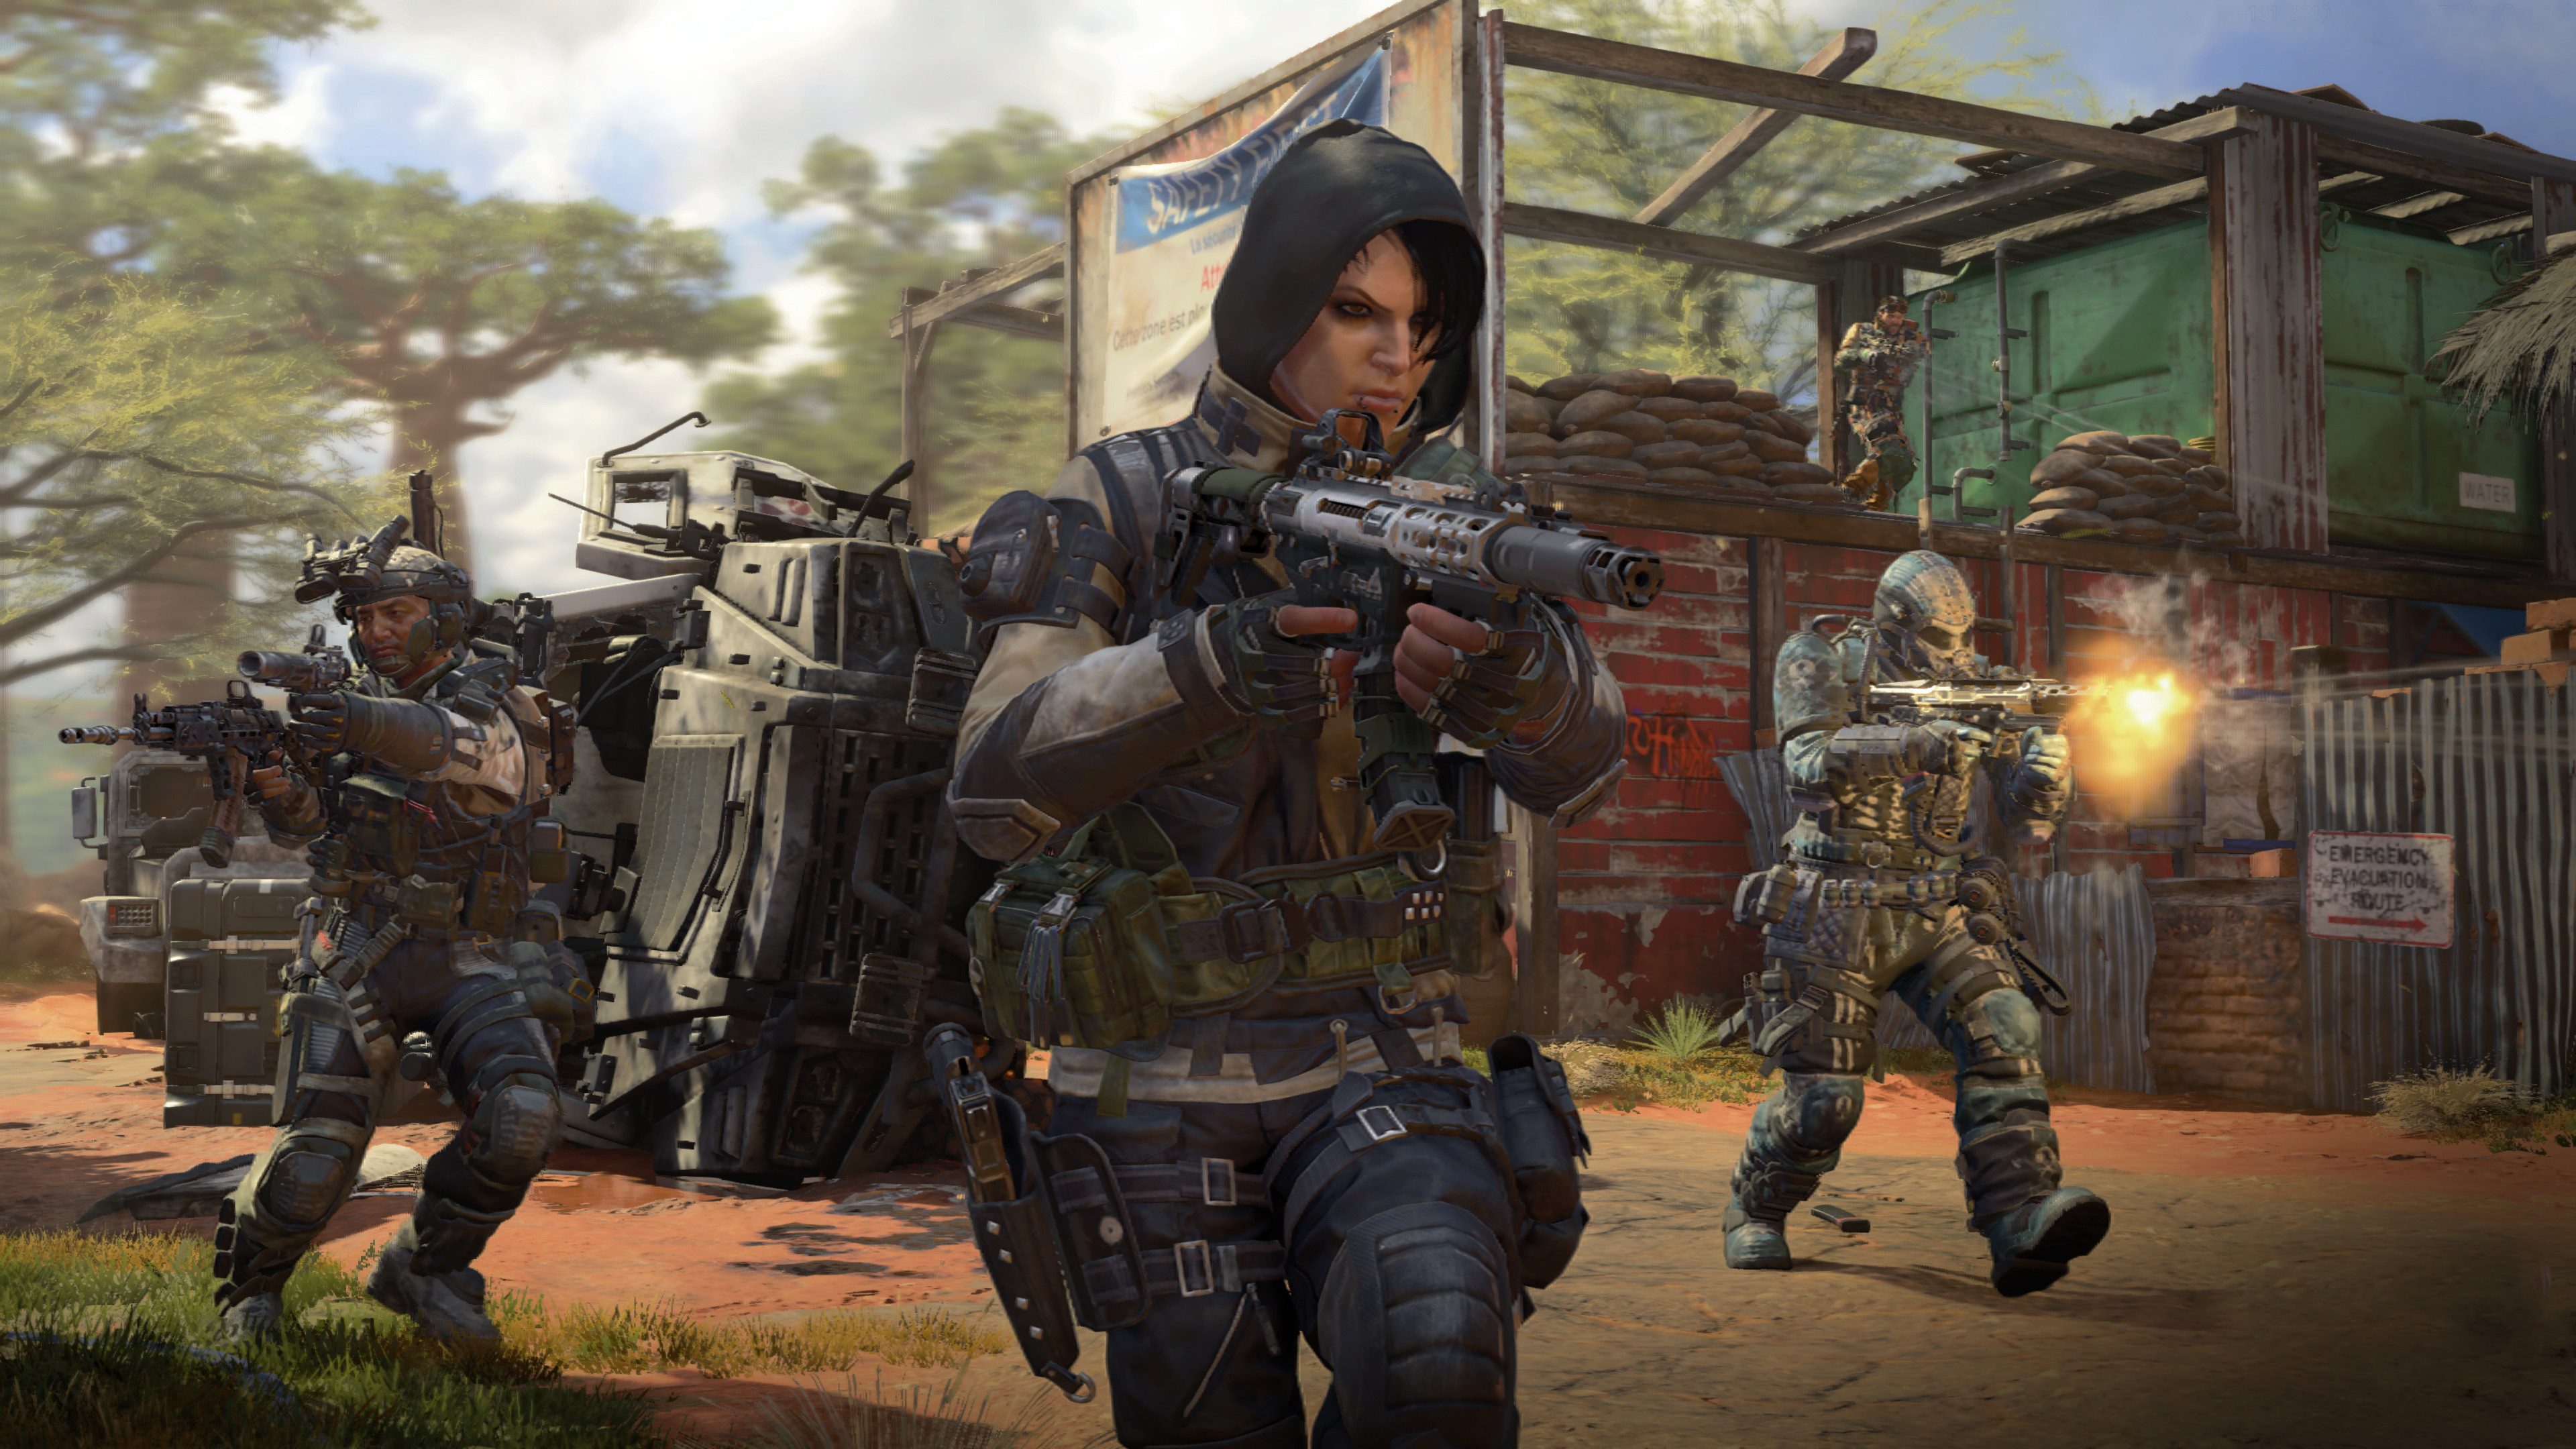 Wallpaper 4k Call Of Duty Black Ops 4 Dead Of The Night 4k 2018